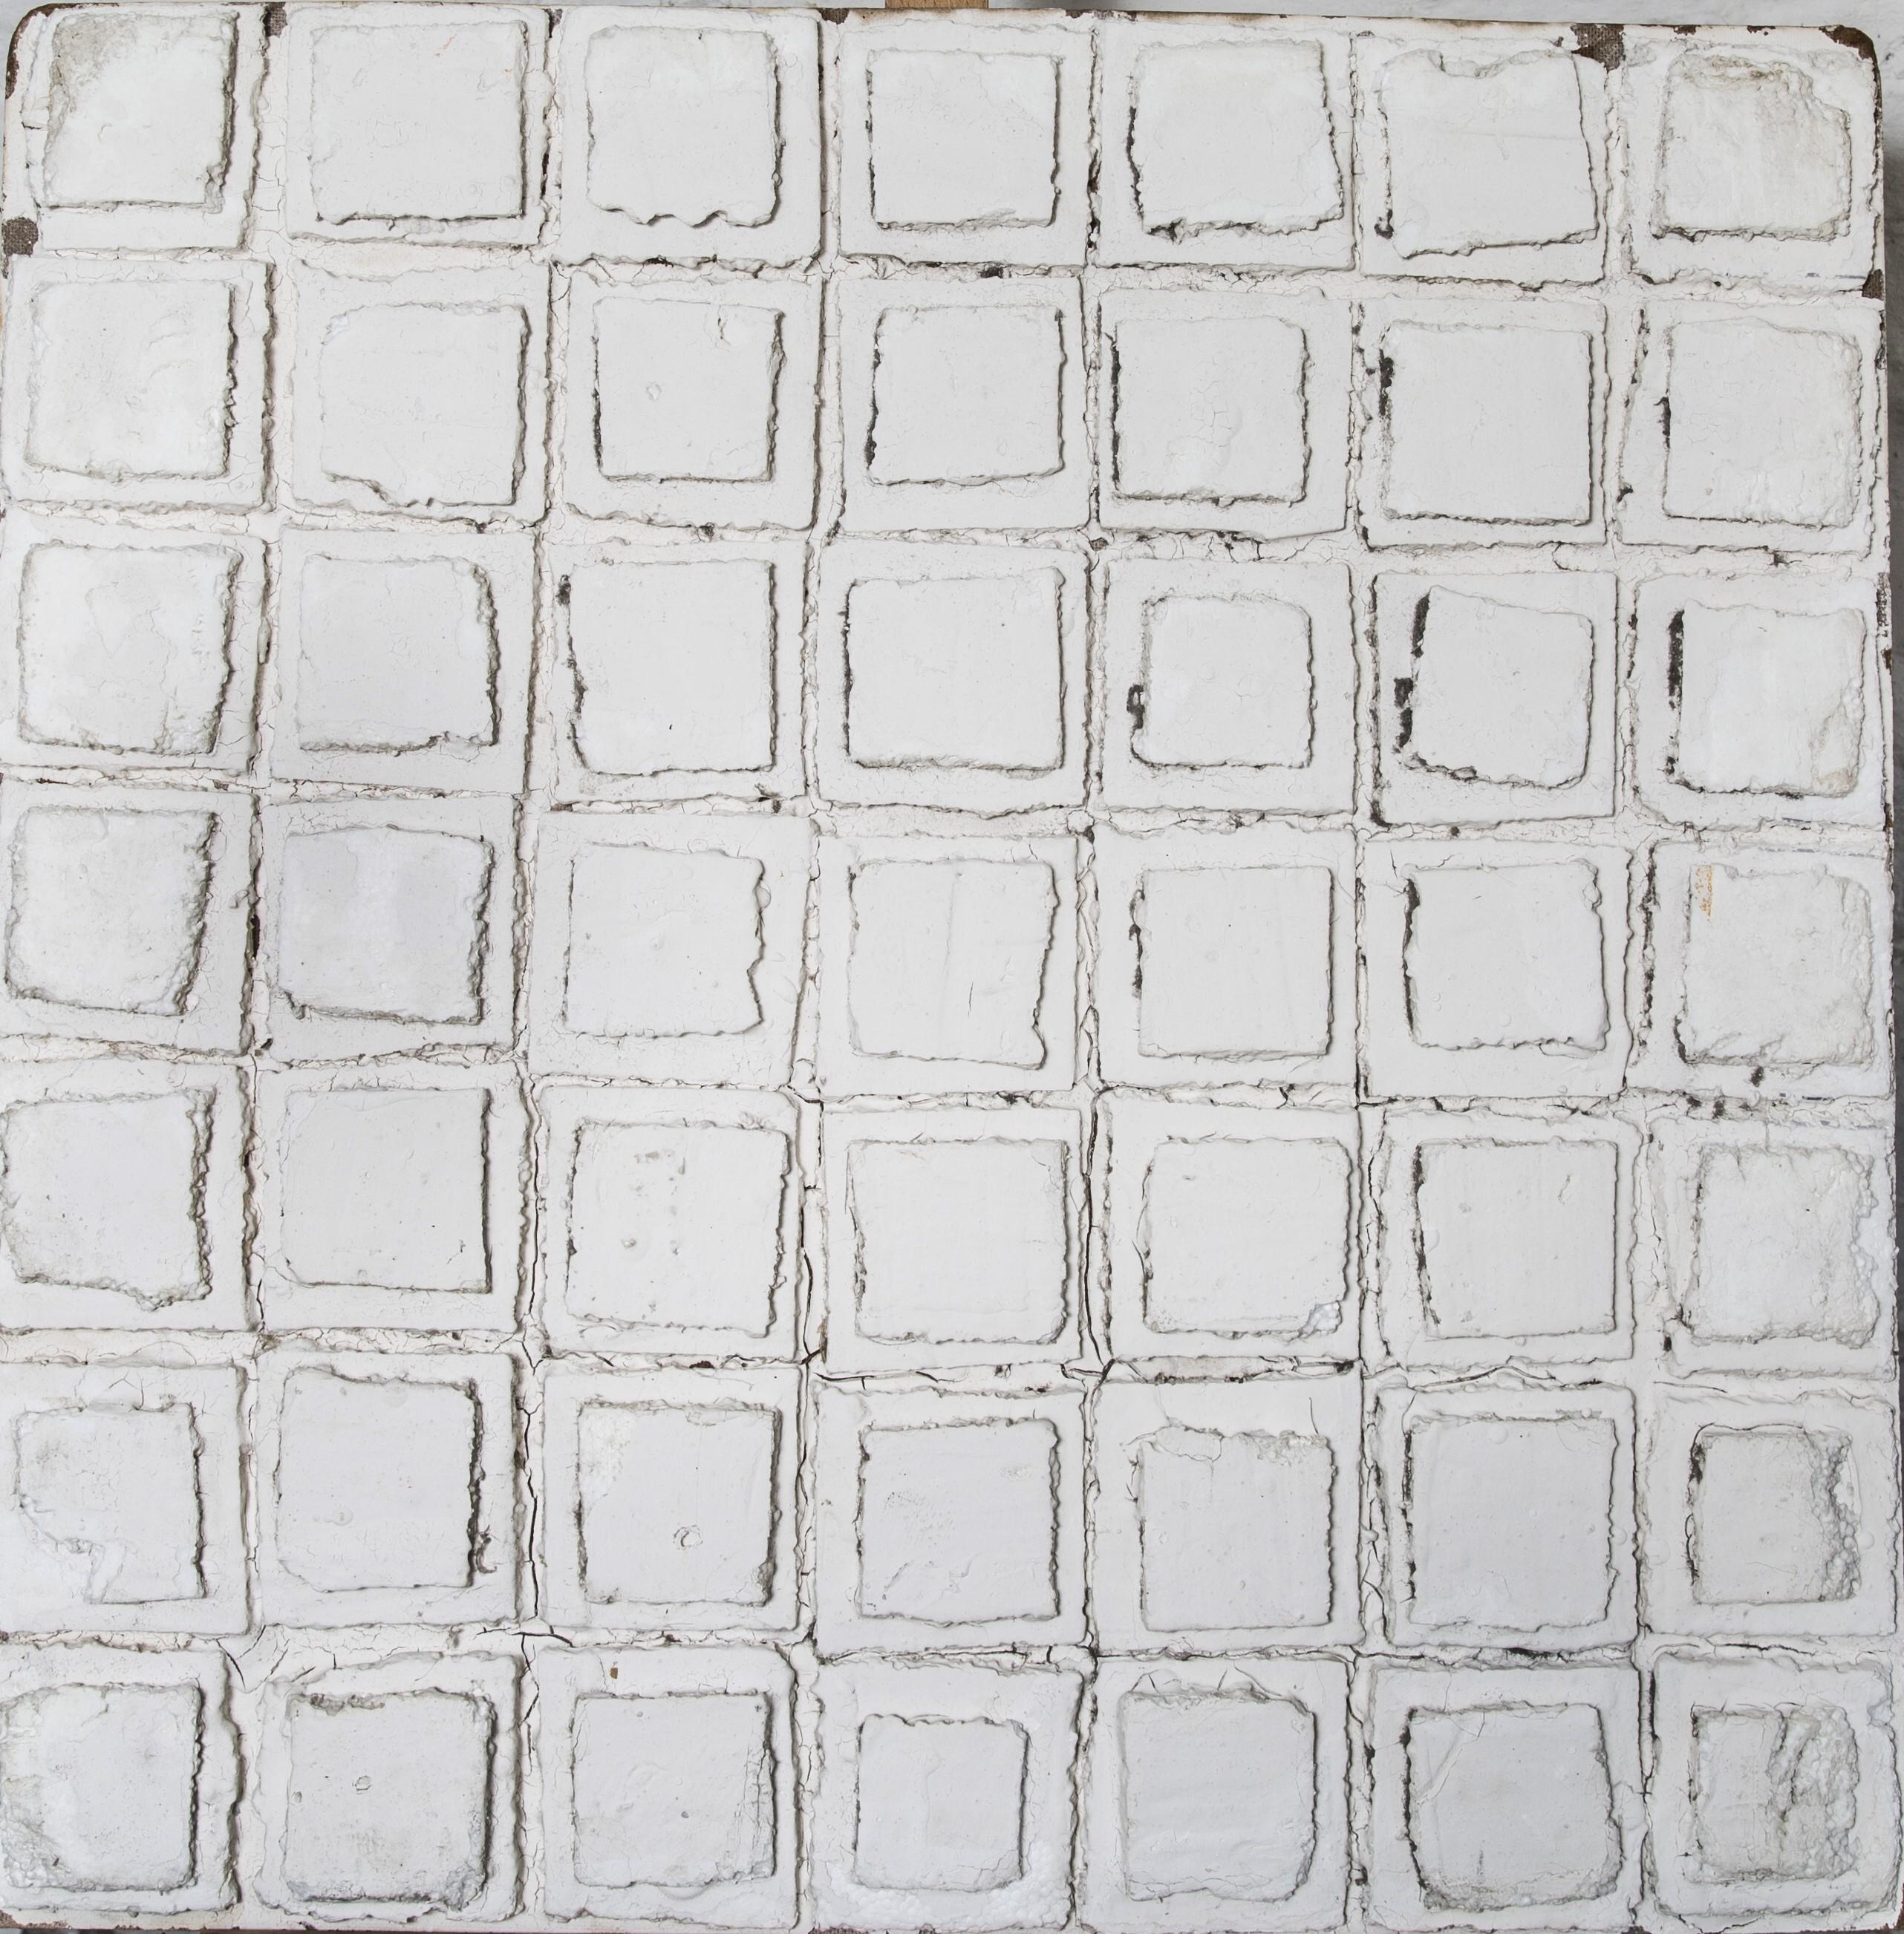 7x7 grid